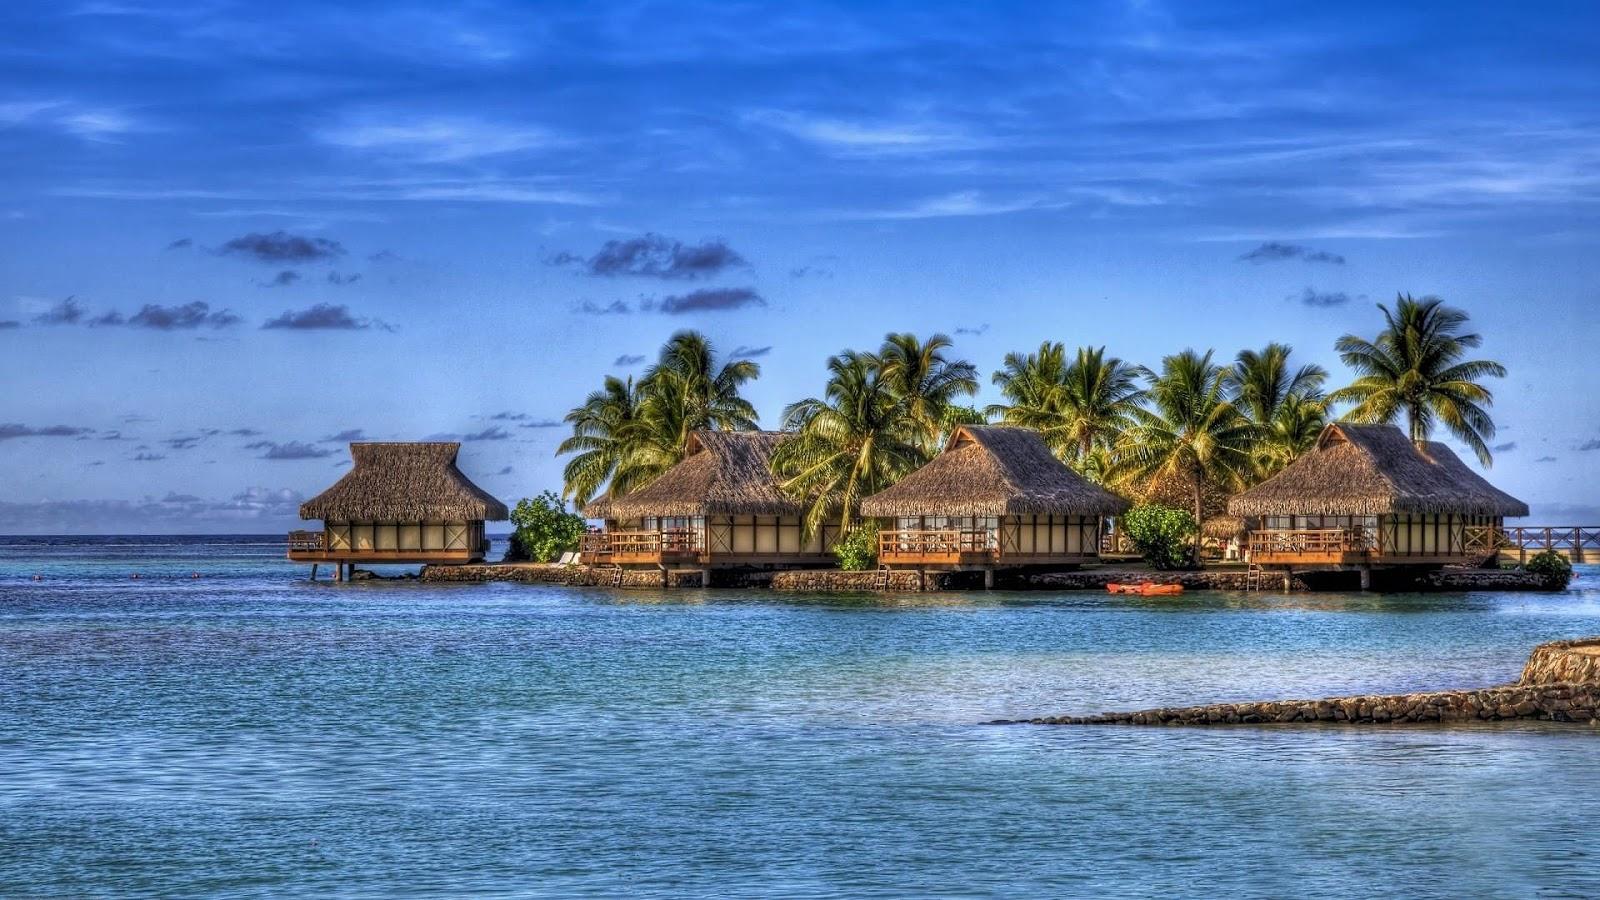 Tropical Island Getaways: Beautiful Island To Visit